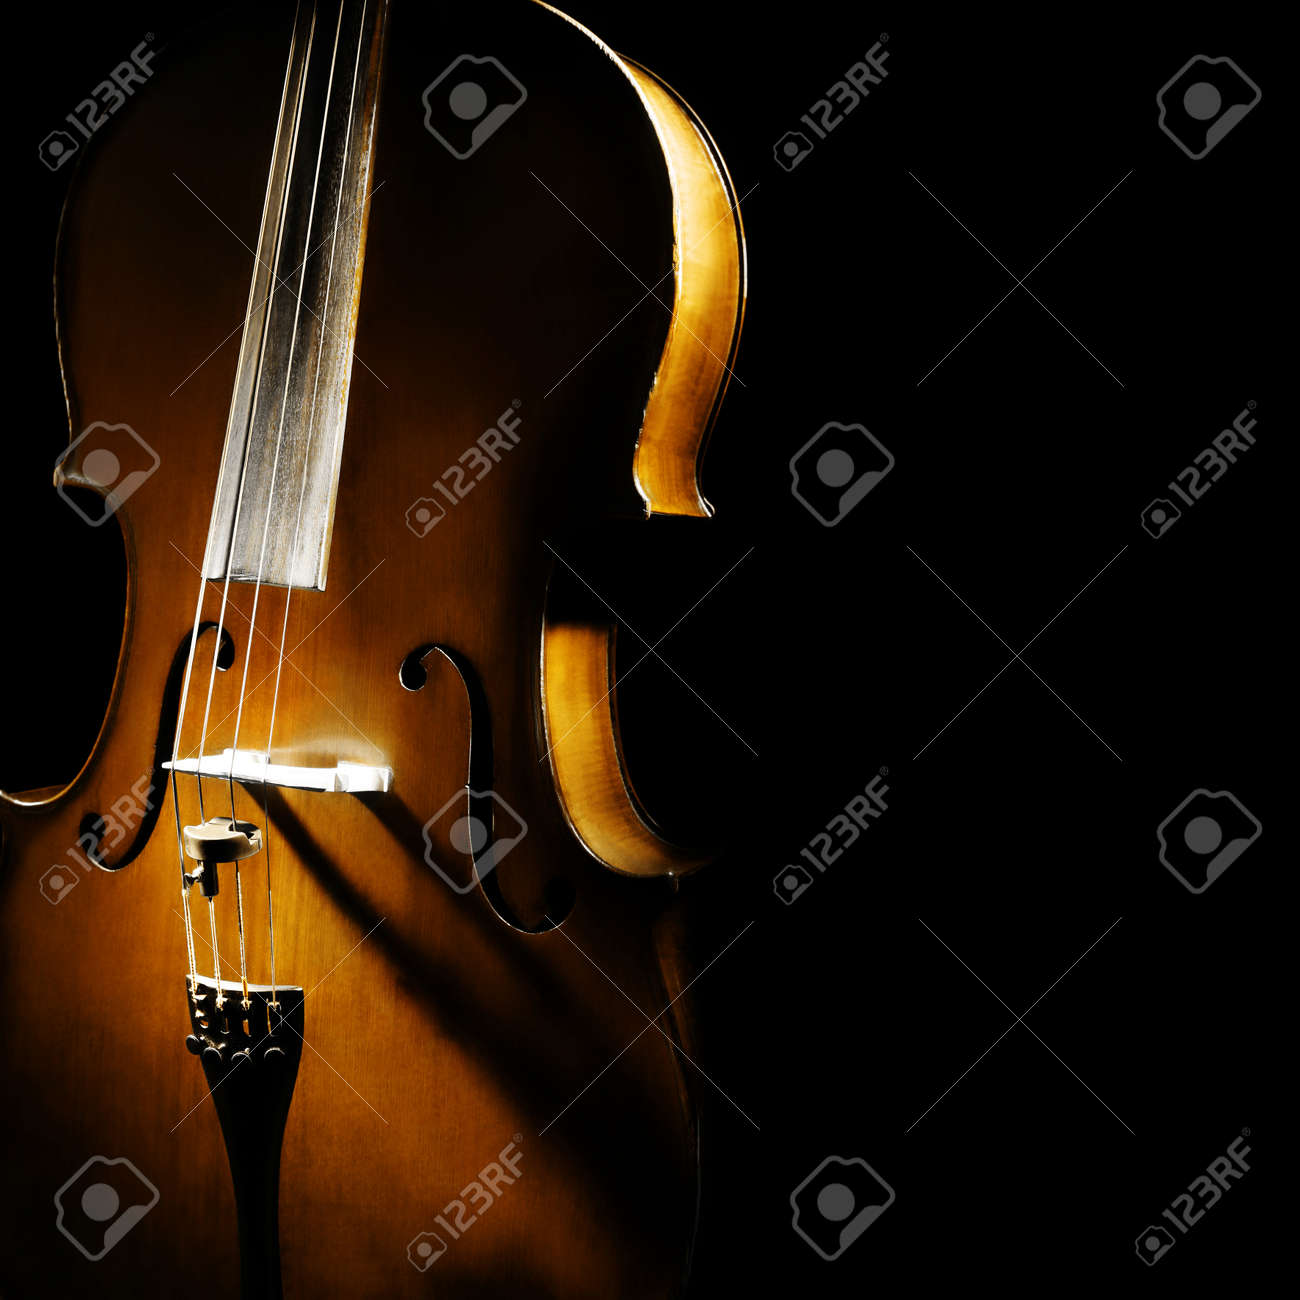 Cello orchestra musical instruments Standard-Bild - 22220710